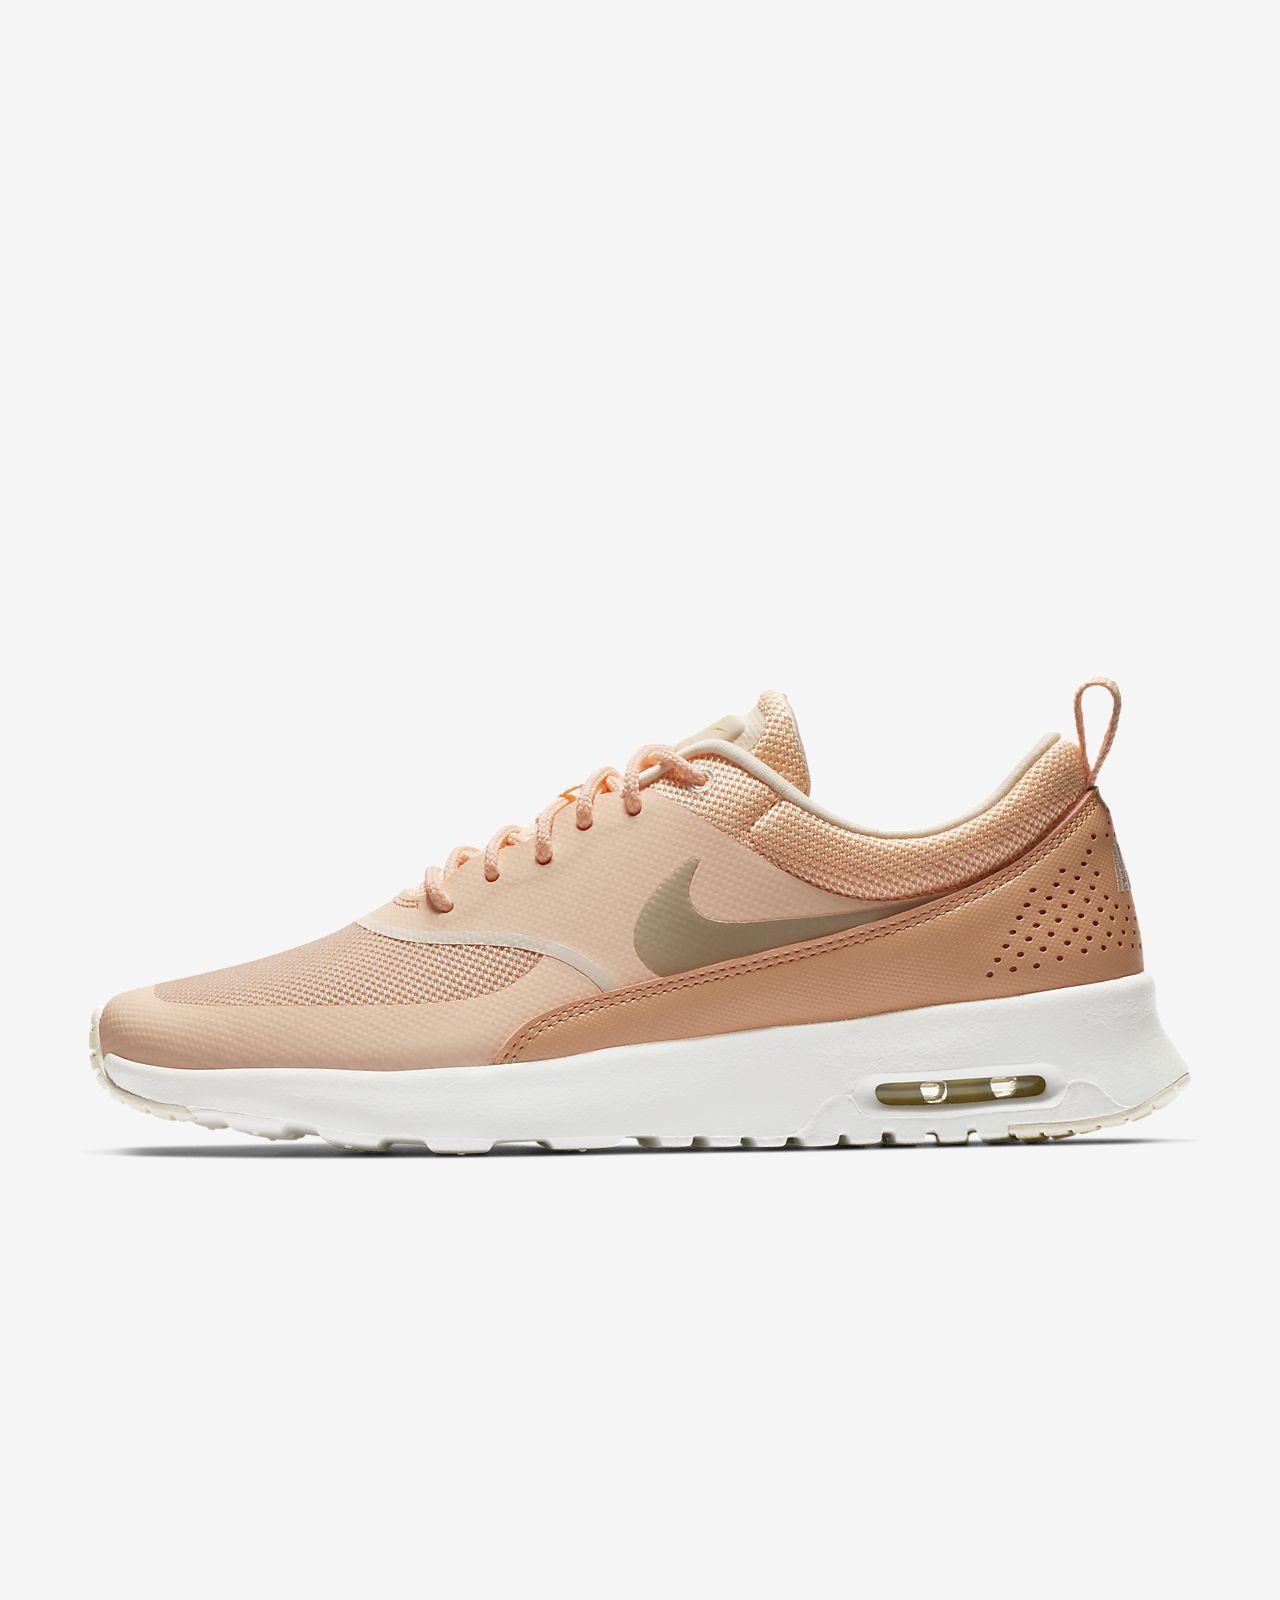 outlet store 180ed eaae3 Nike Air Max Thea